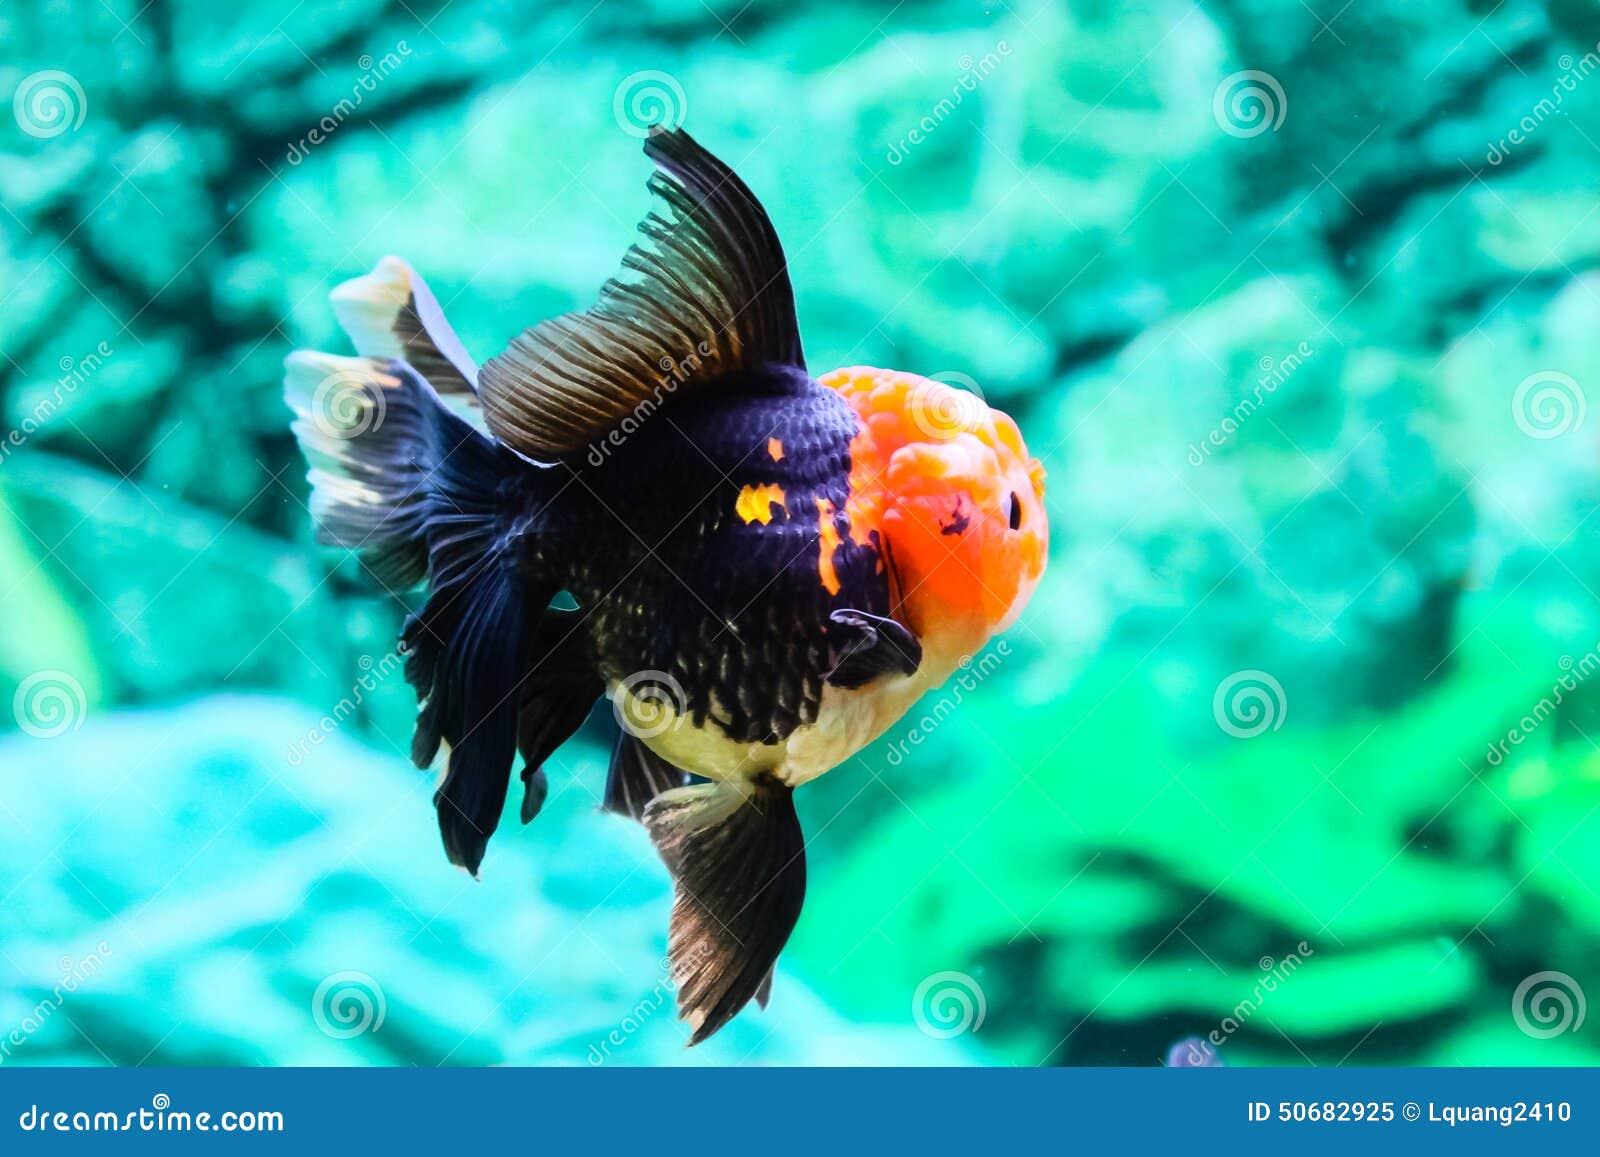 Download 关闭在水族馆的金鱼 库存图片. 图片 包括有 金子, 移动, 宠物, 敌意, 水生, 红色, betsy - 50682925